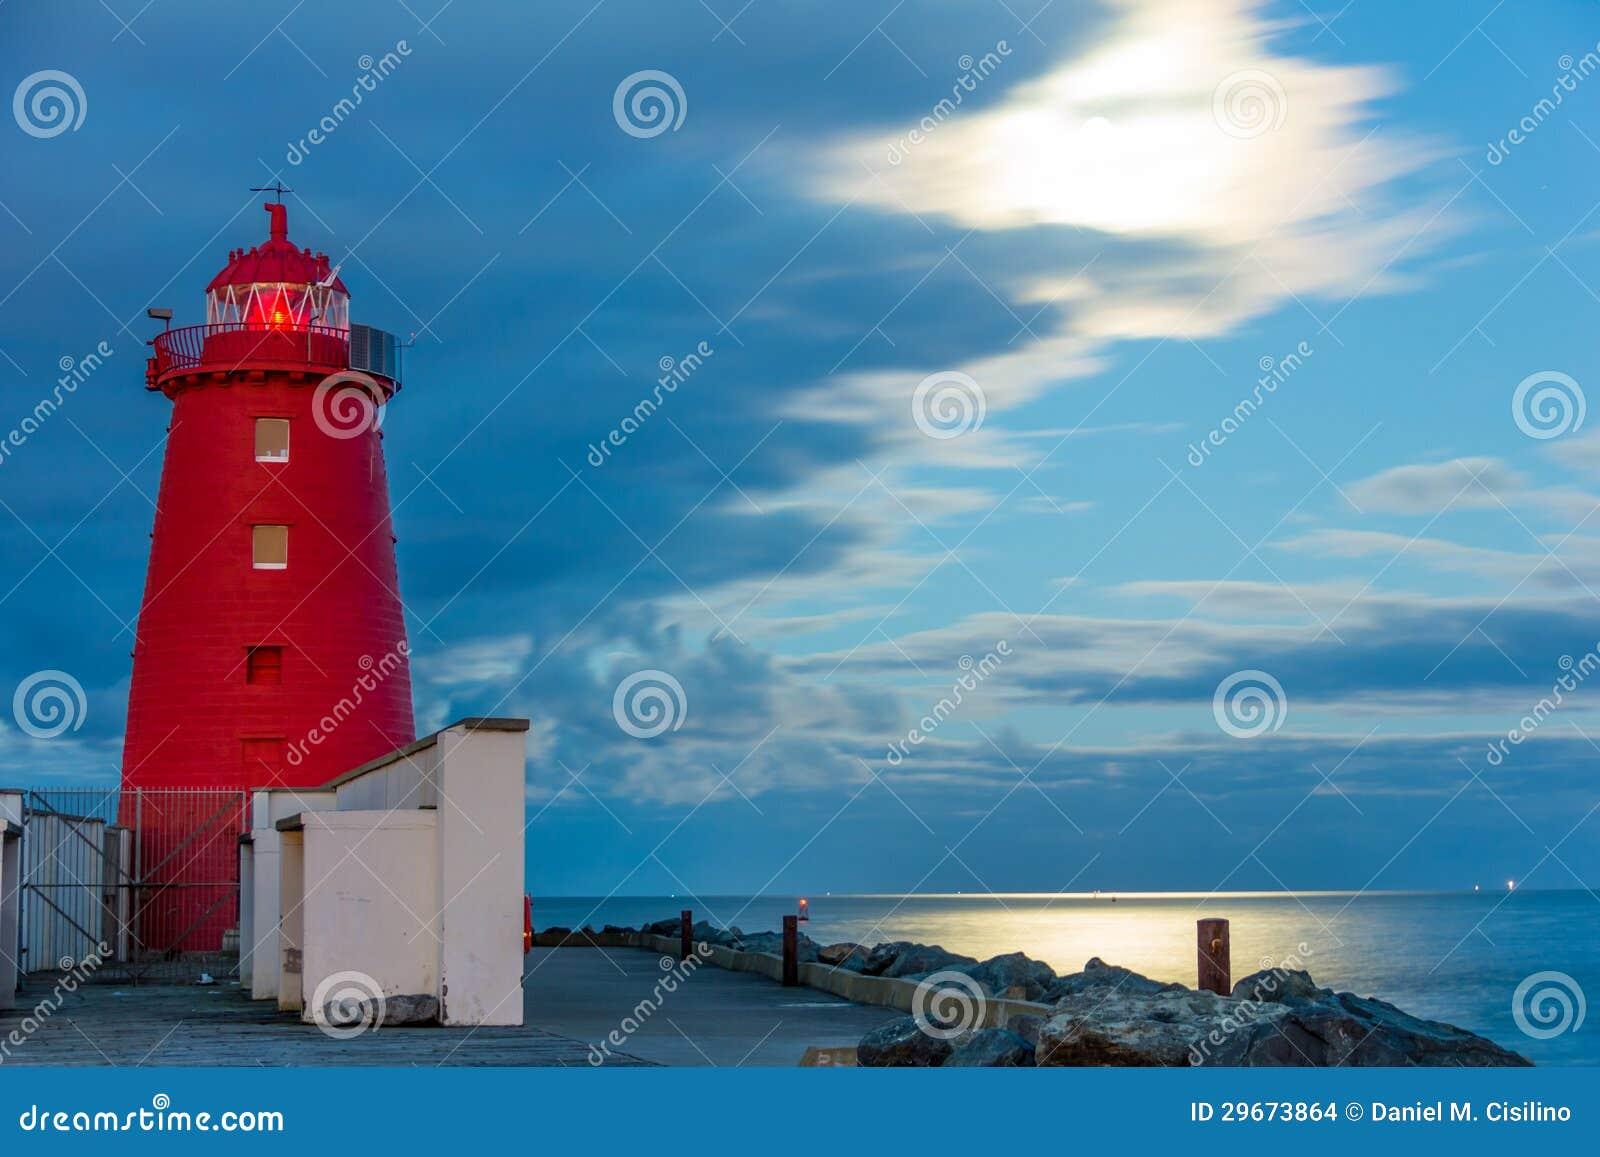 Poolbeg latarnia morska przy nocą. Dublin. Irlandia